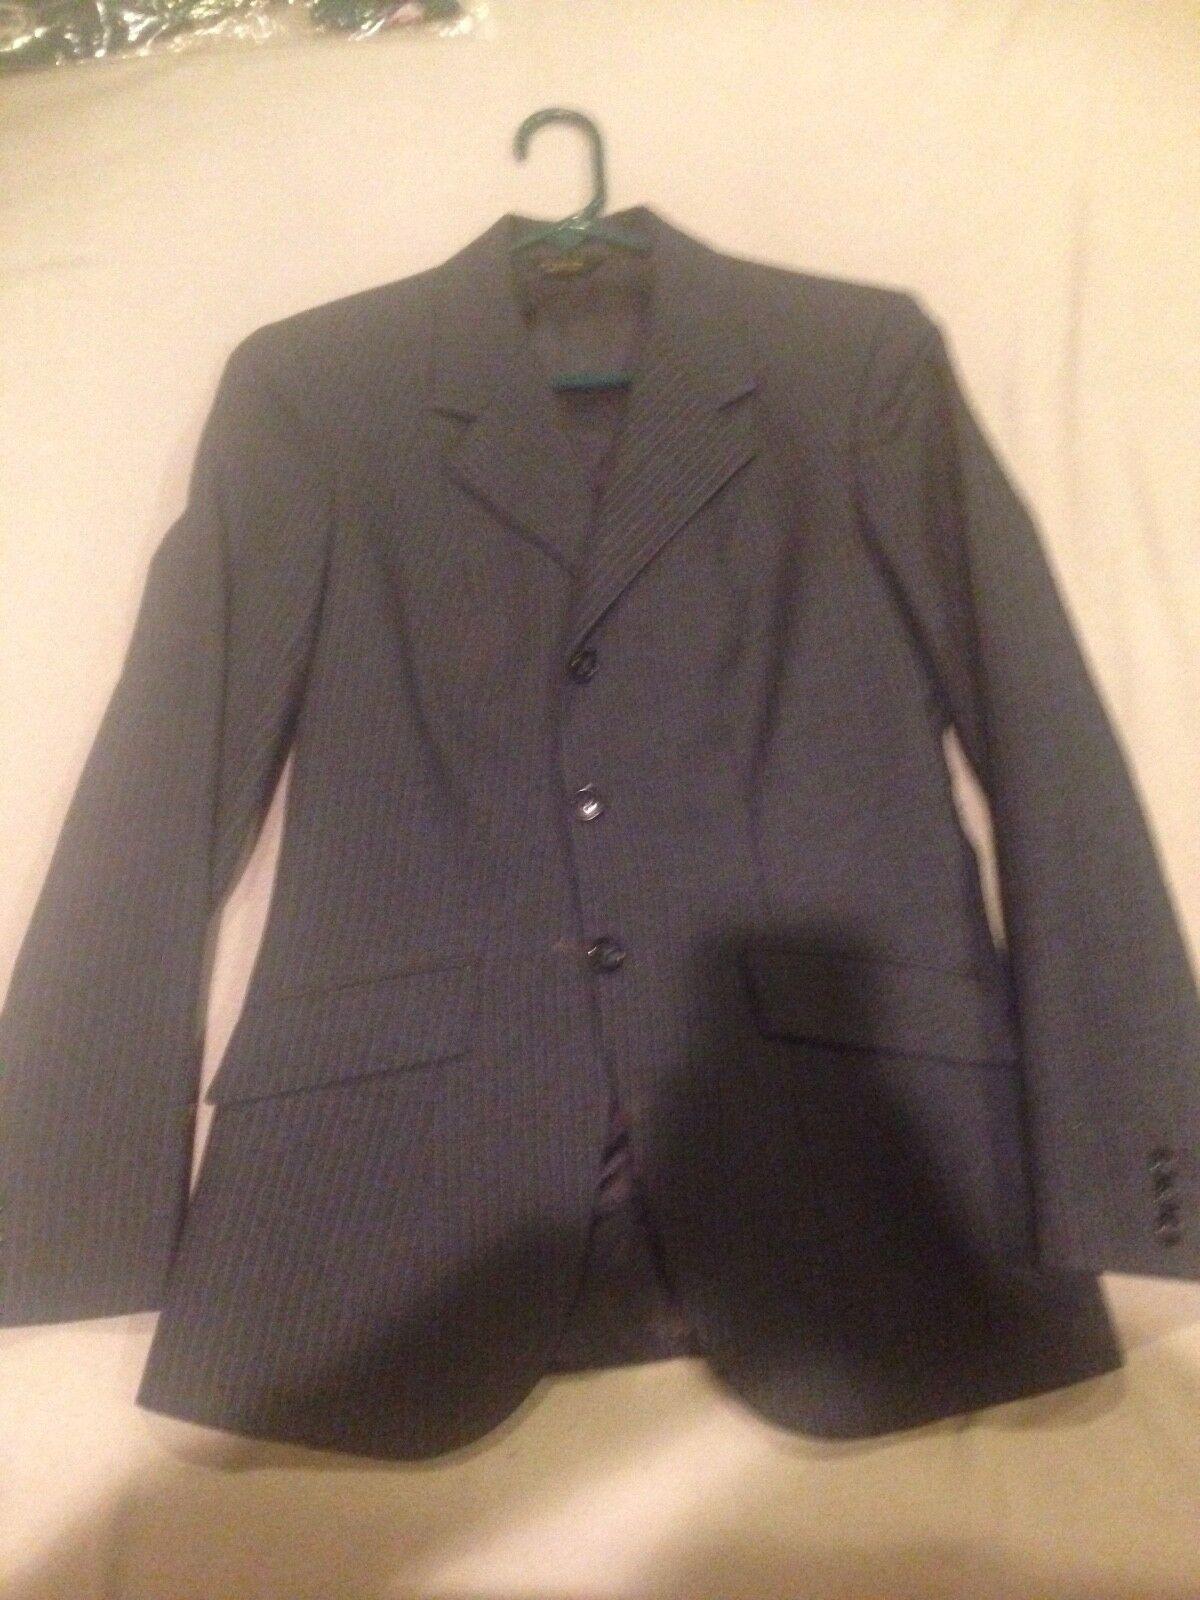 Ladies size 12 Tailored Sportsmen Navy bluee pin stripes huntcoat